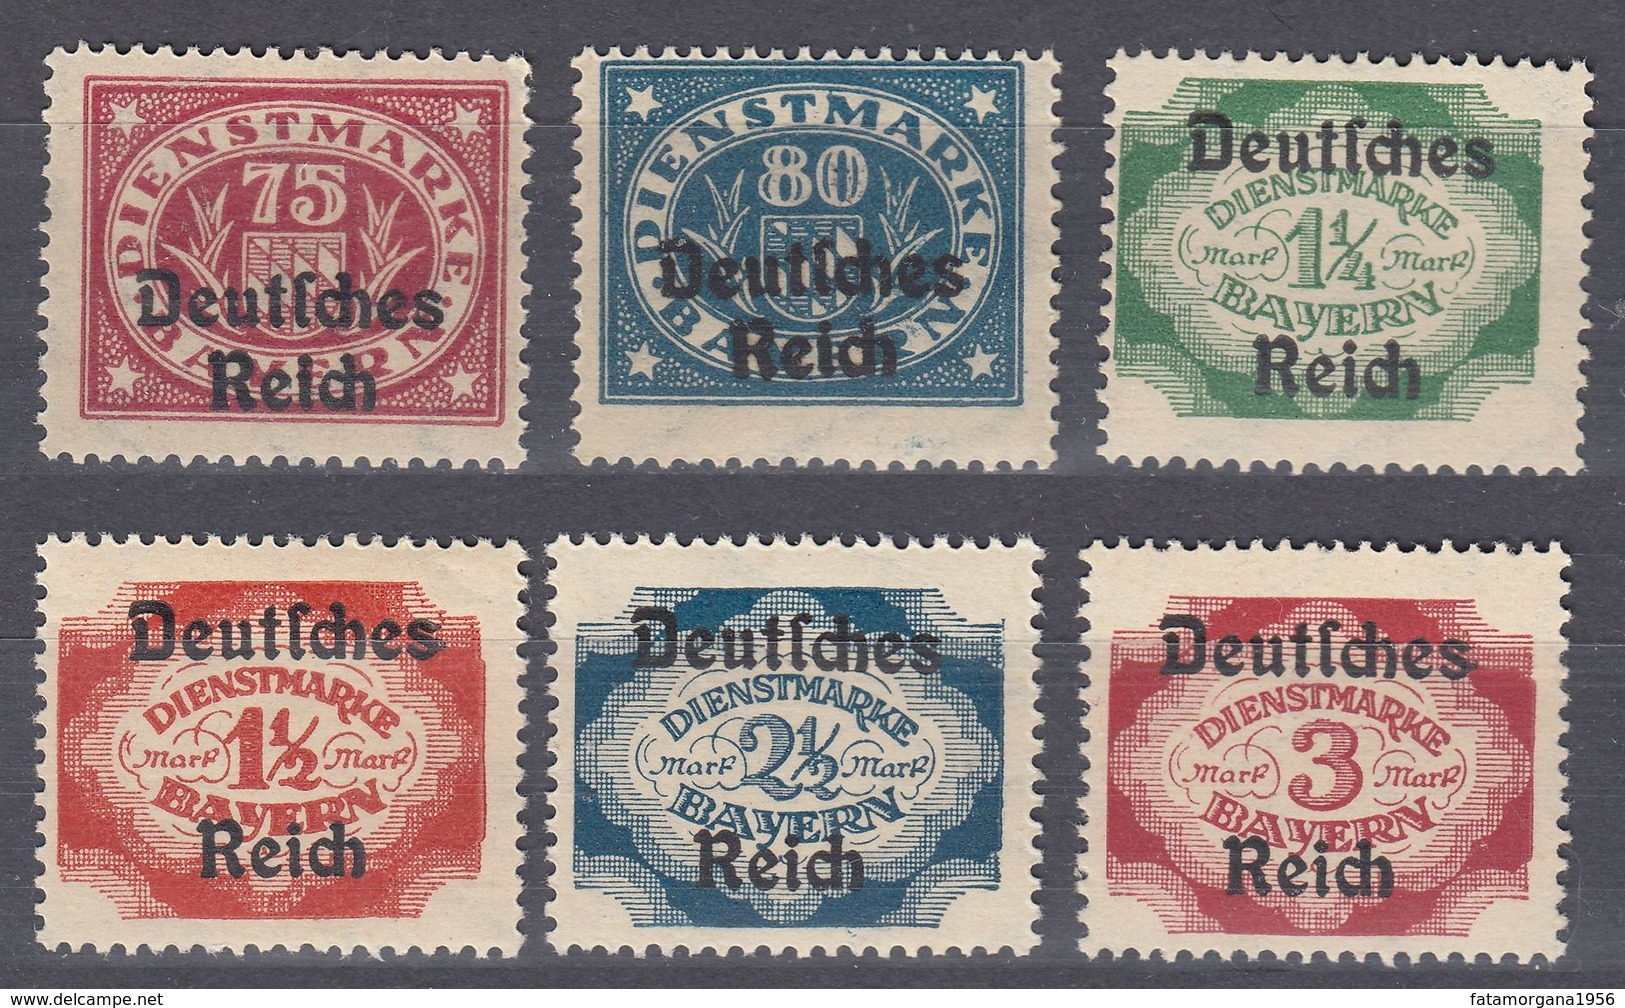 BAVIERA - BAYERN -  1920 - Lotto 6 Valori Nuovi MNH, Yvert Servizio 70, 71, 74, 75, 76 E 77. - Bavaria